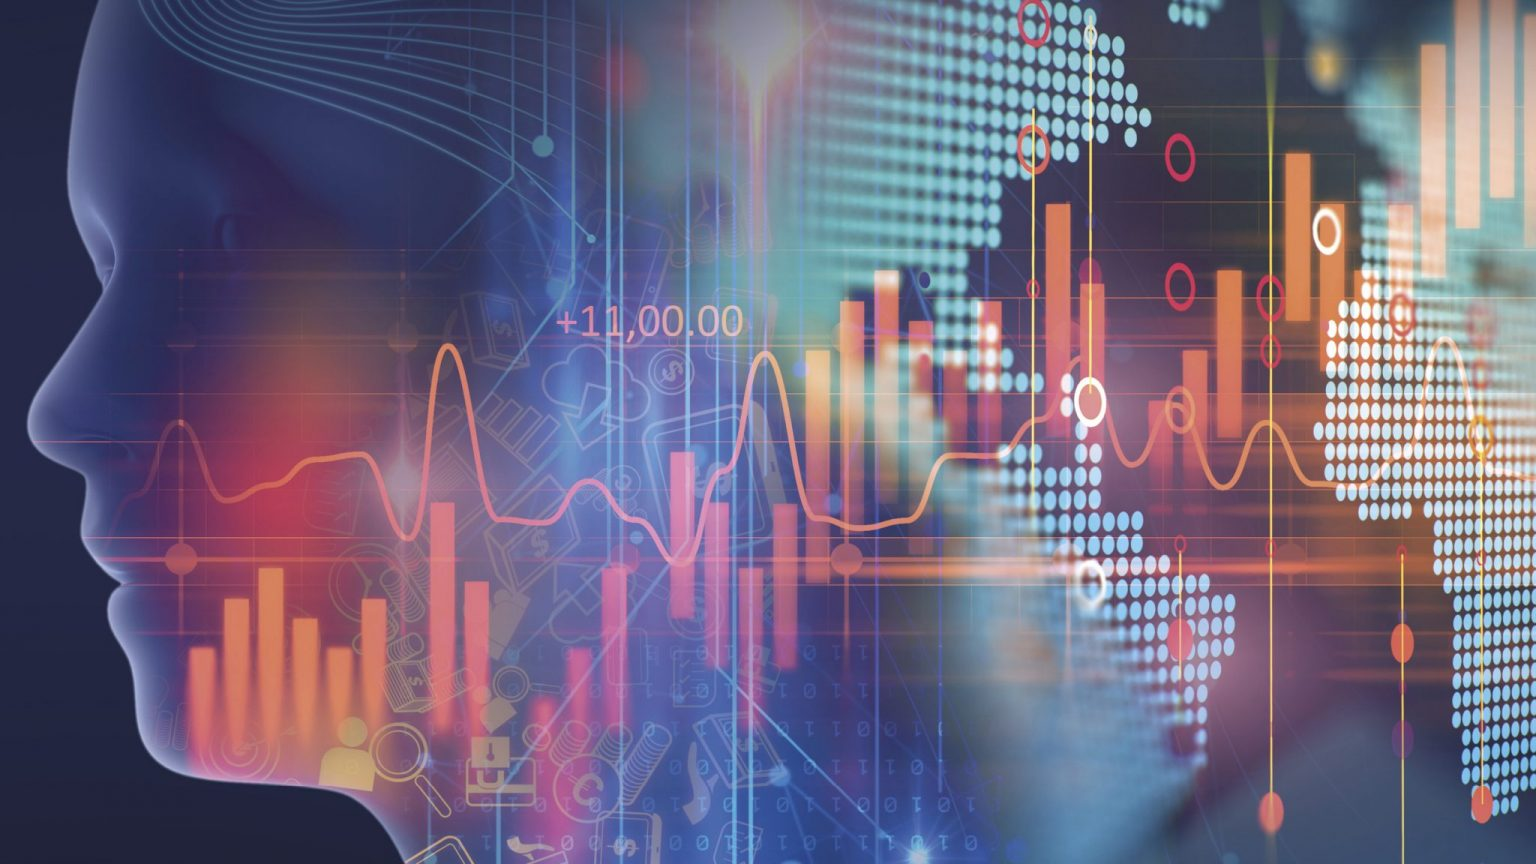 MasterPro Data Science Modélisation Statistique